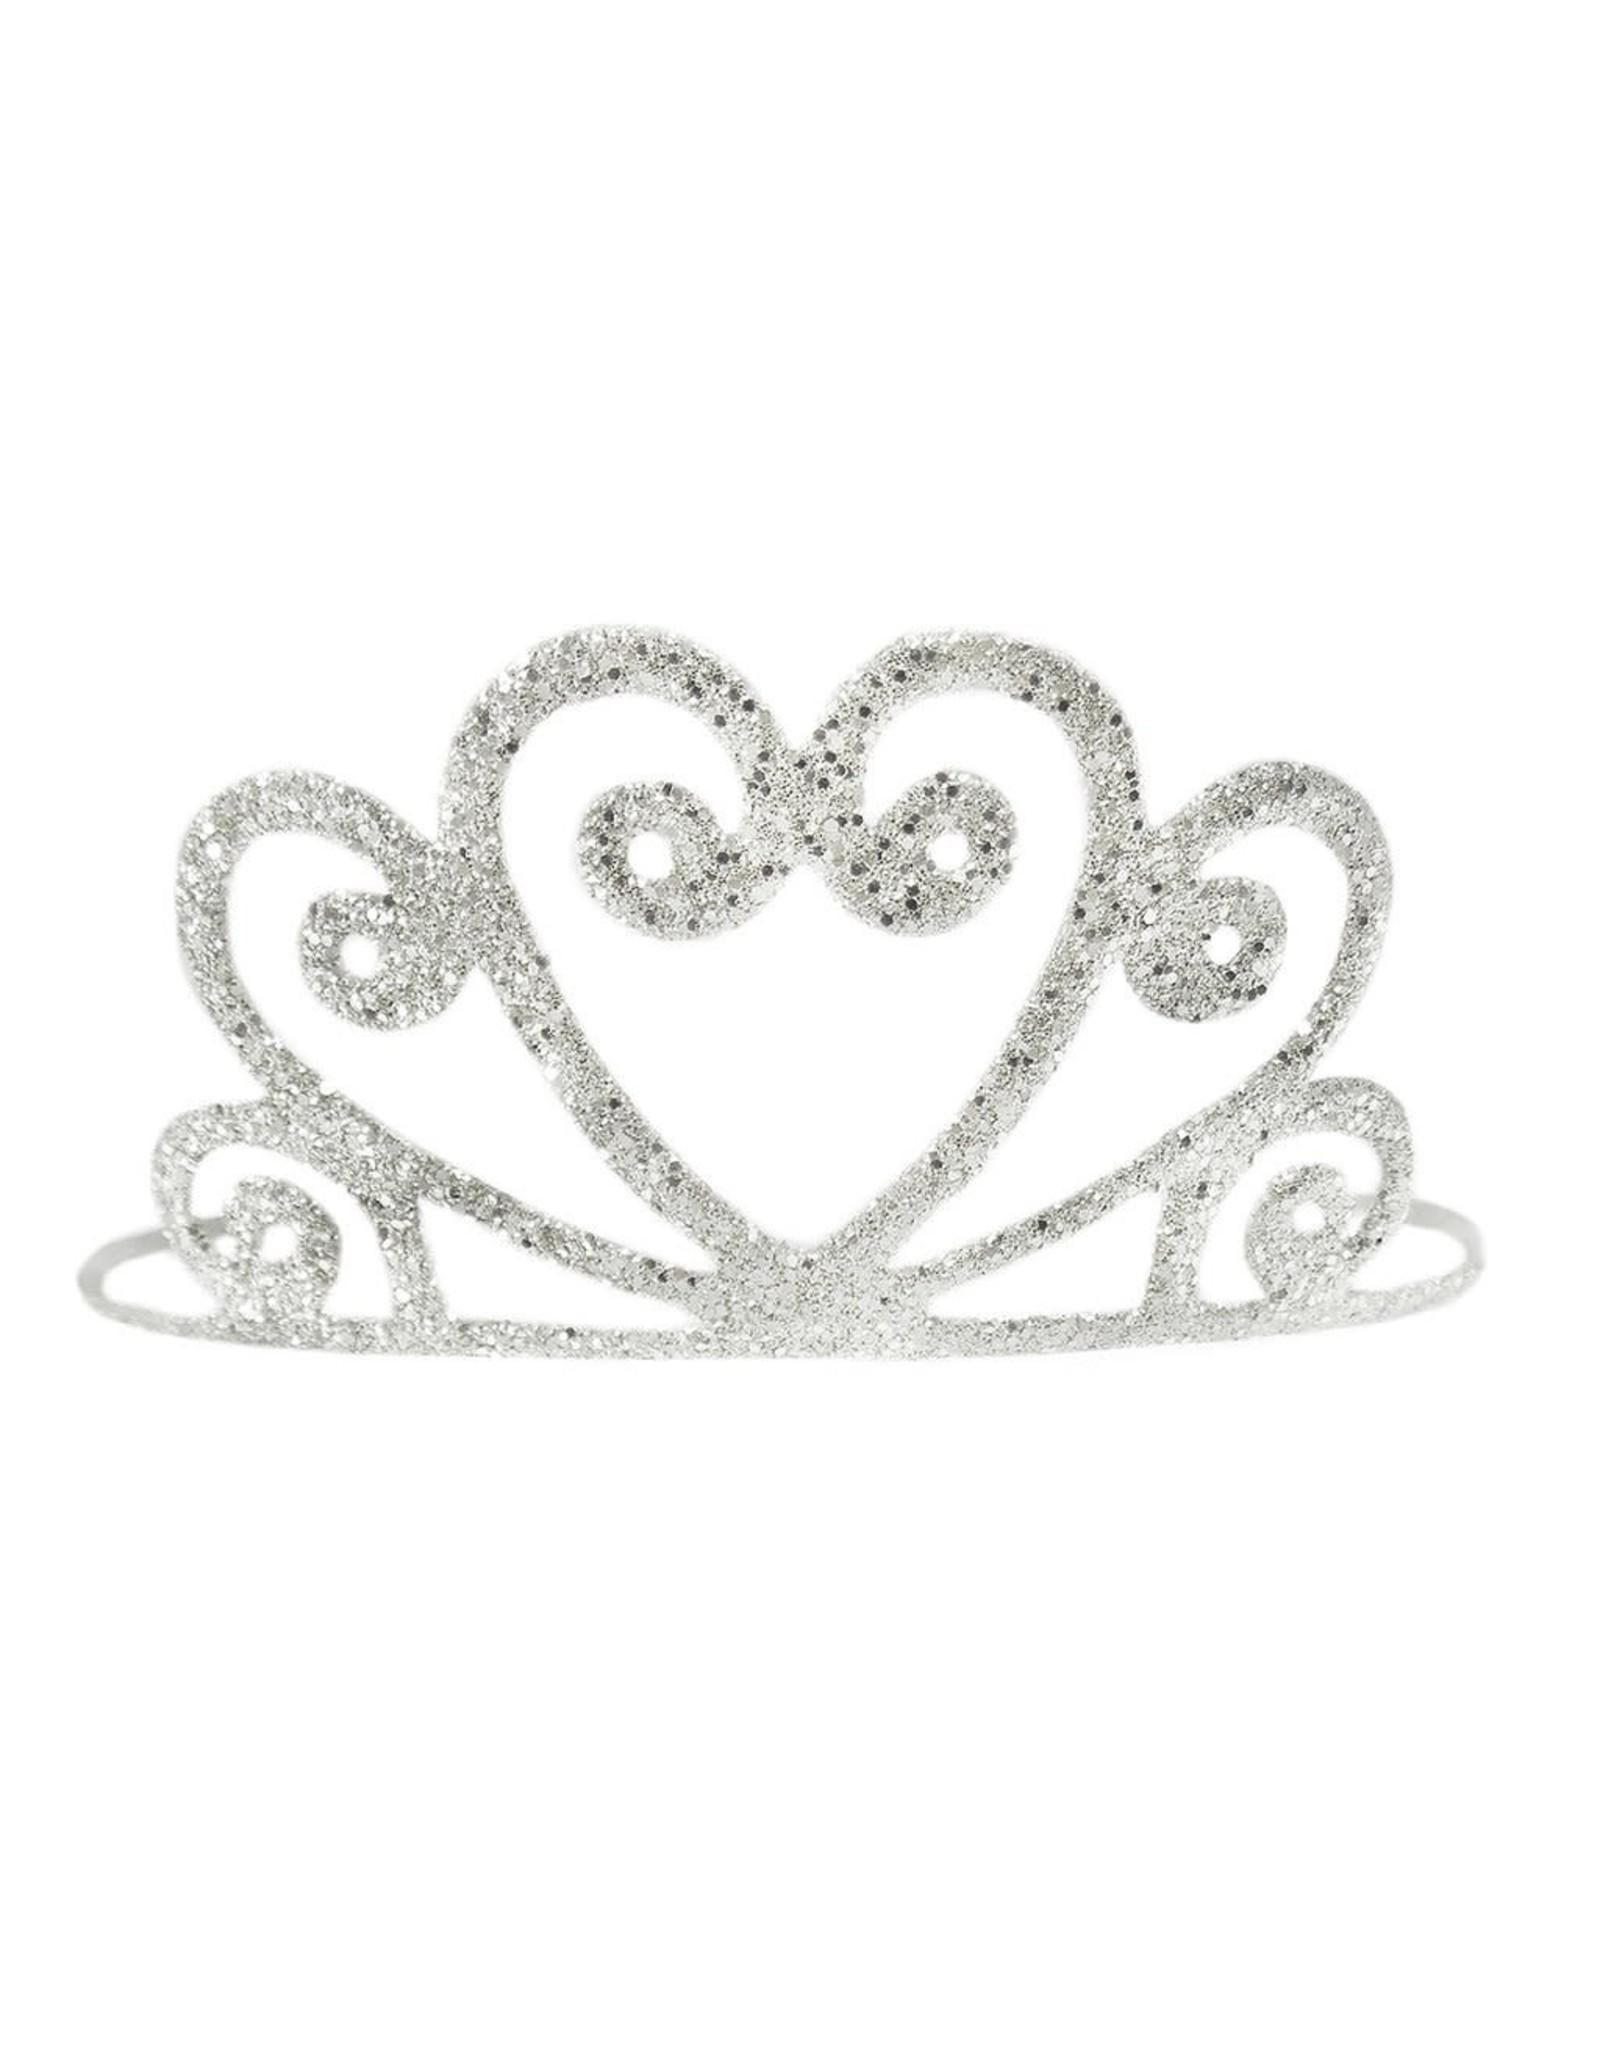 Great Pretenders Gold or Silver Glitter Tiara